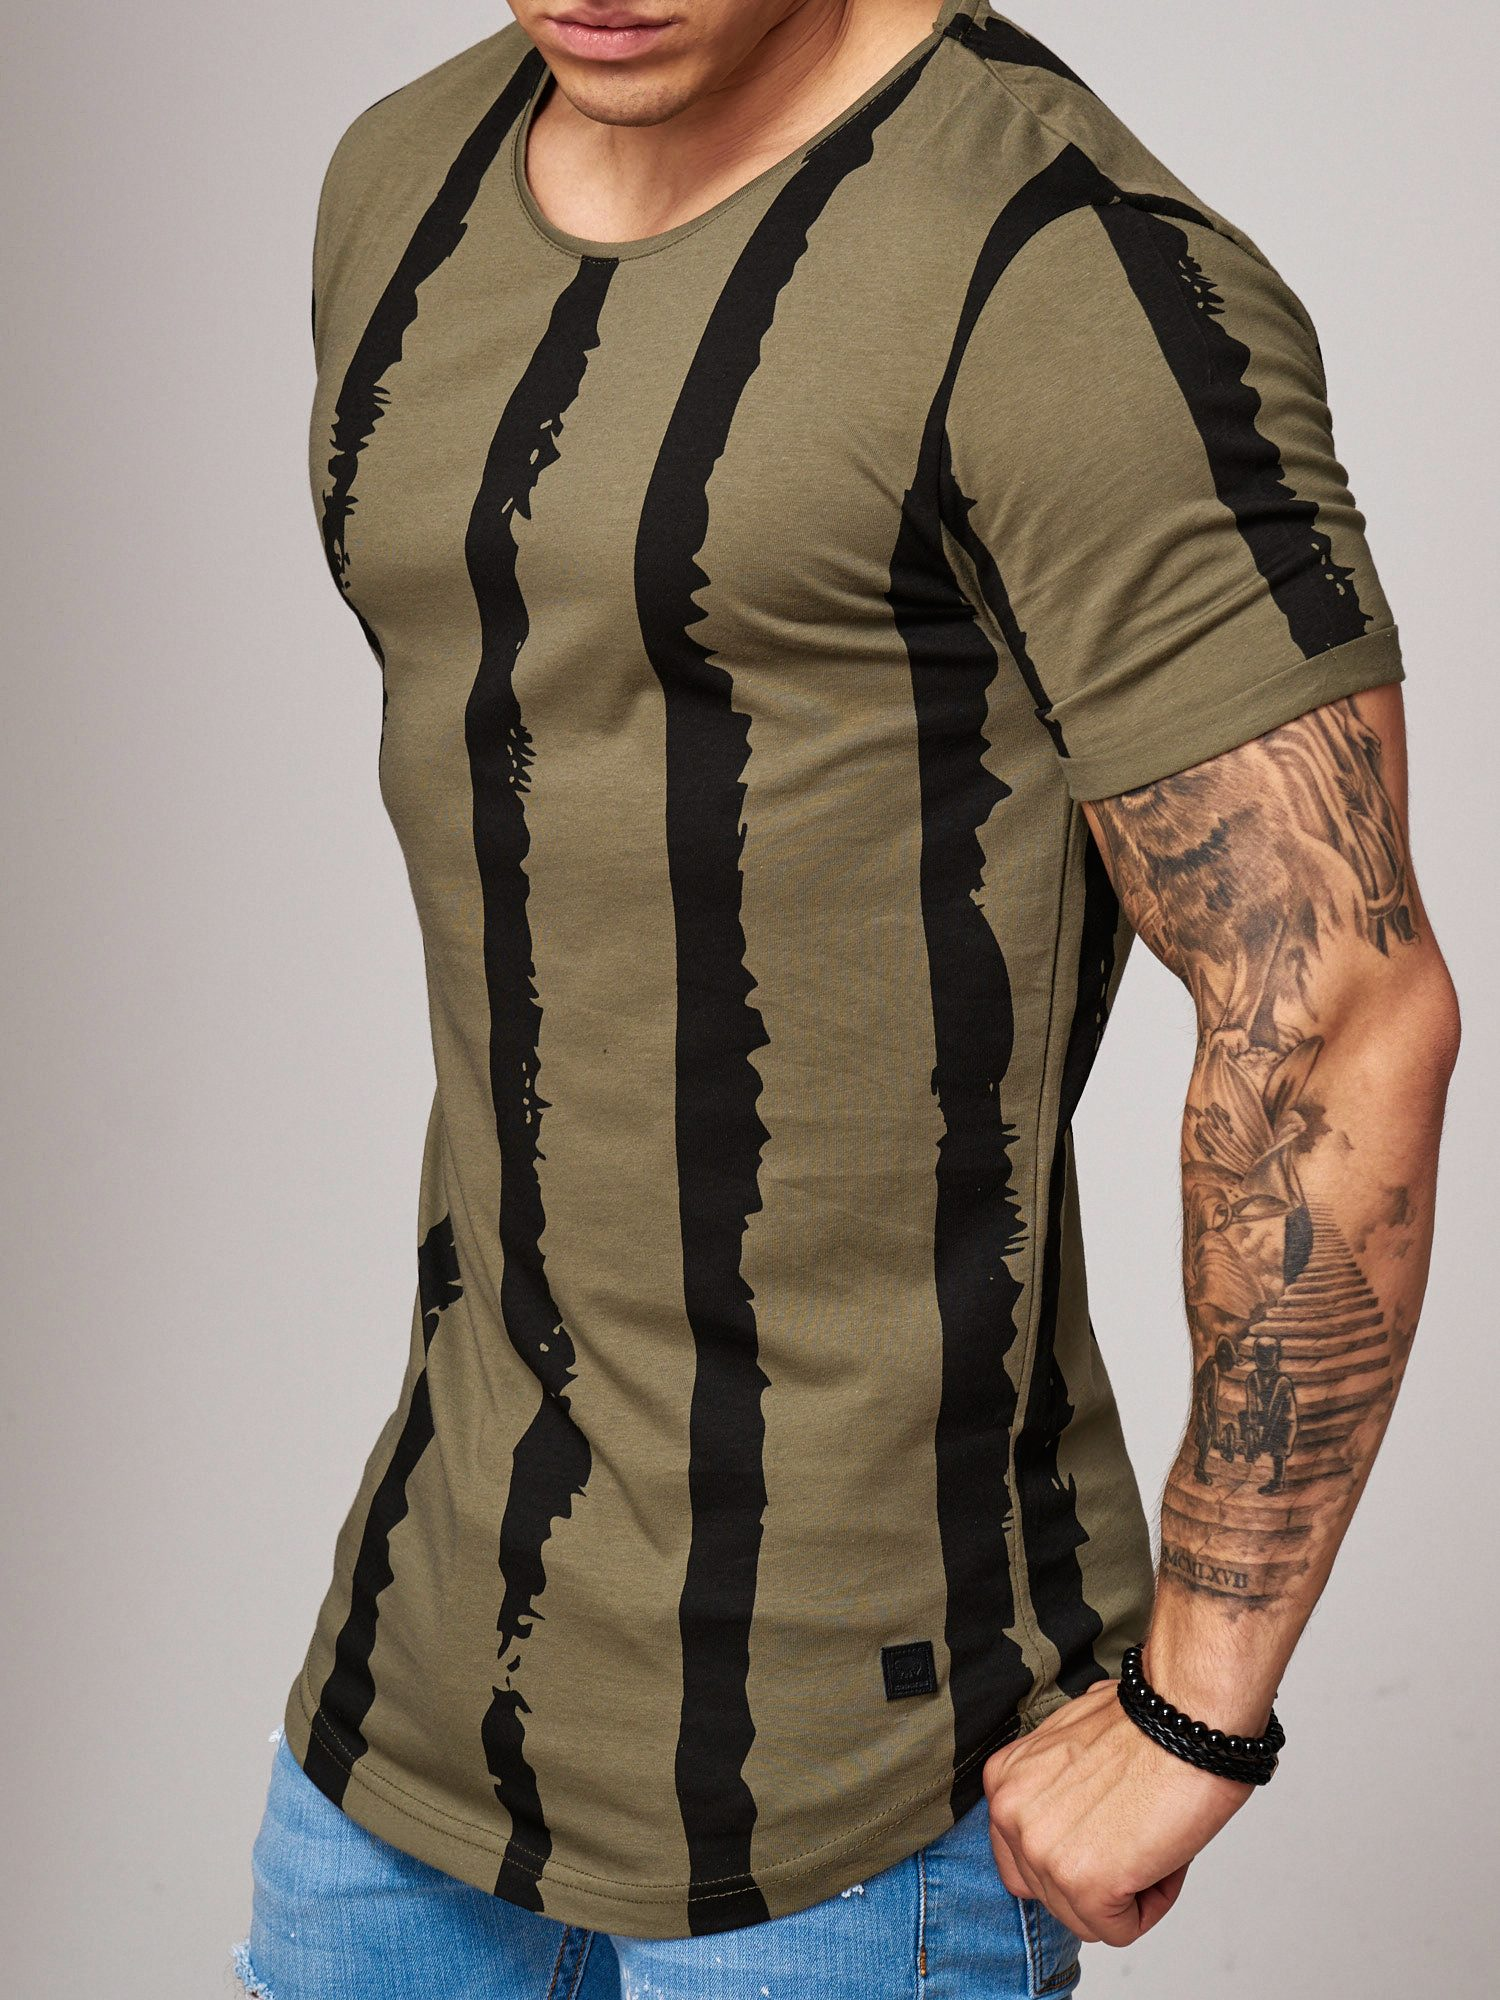 T-shirt-da-Uomo-Polo-Shirt-a-Maniche-Corte-printshirt-Polo-a-Maniche-Corte-17018-John-Kayna miniatura 17